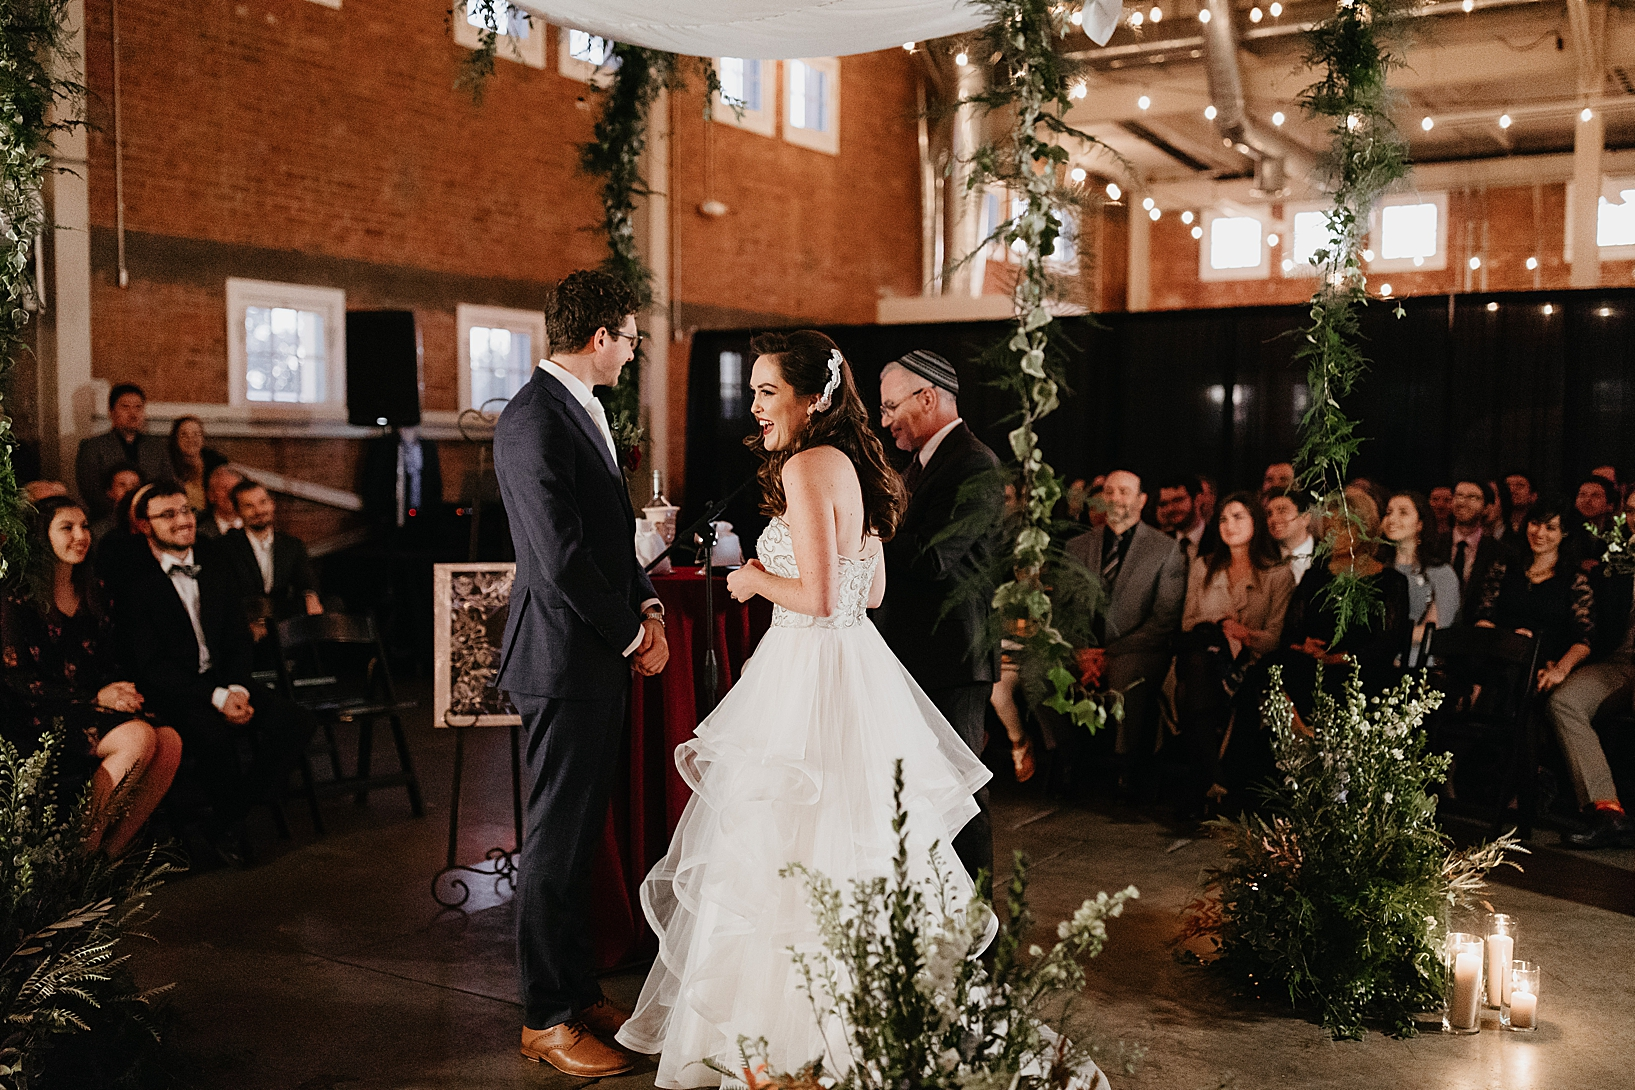 Brick-San-Diego-Winter-Wedding-50.jpg